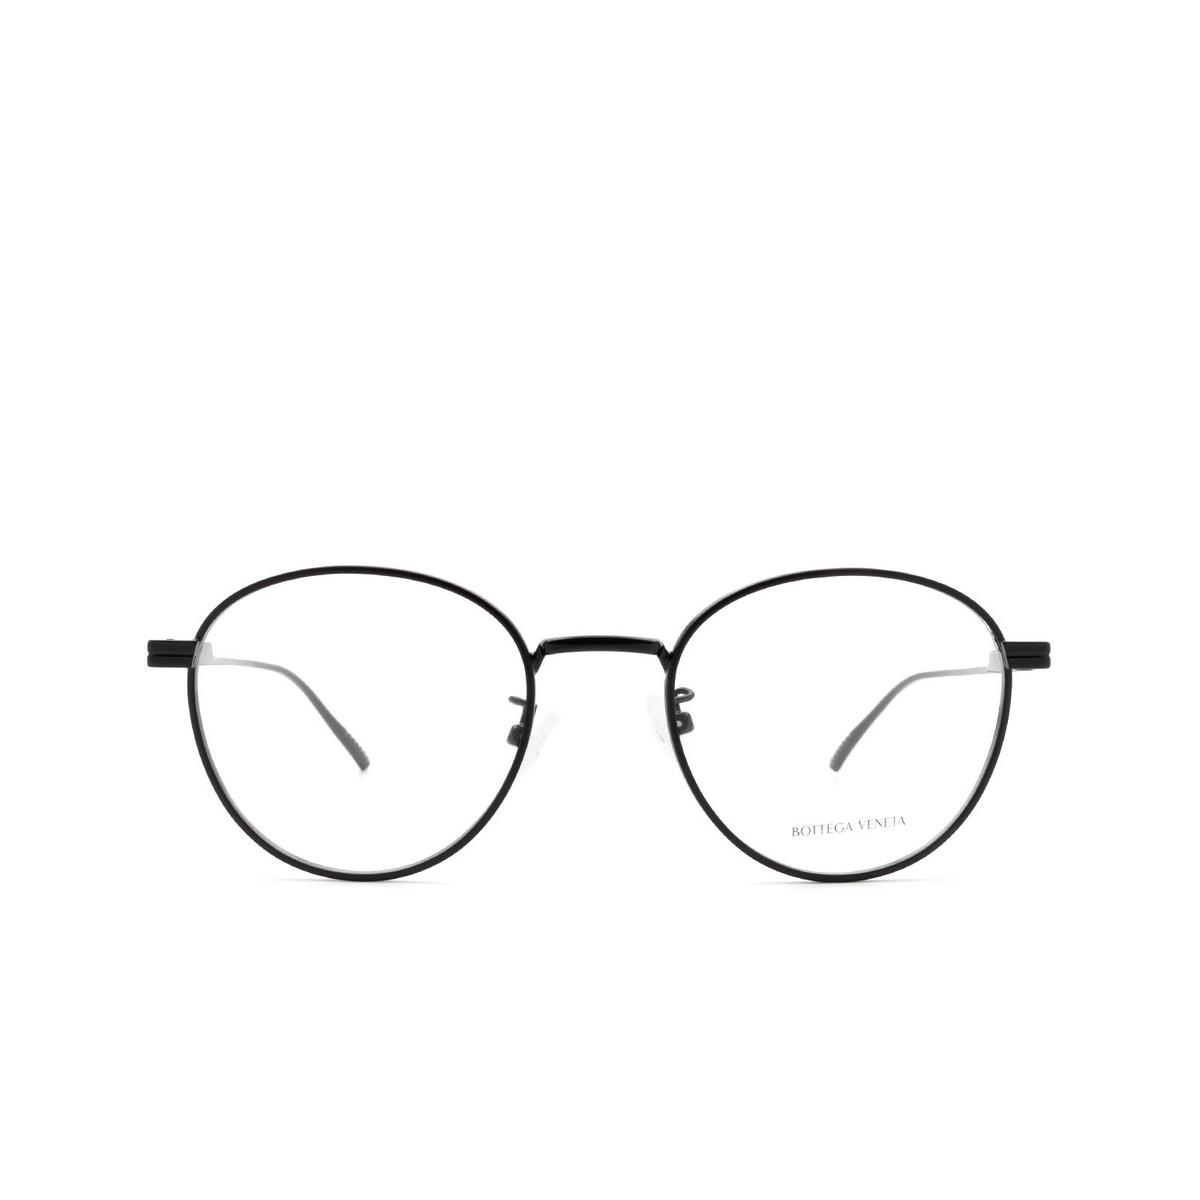 Bottega Veneta® Round Eyeglasses: BV1016OA color Black 001 - front view.